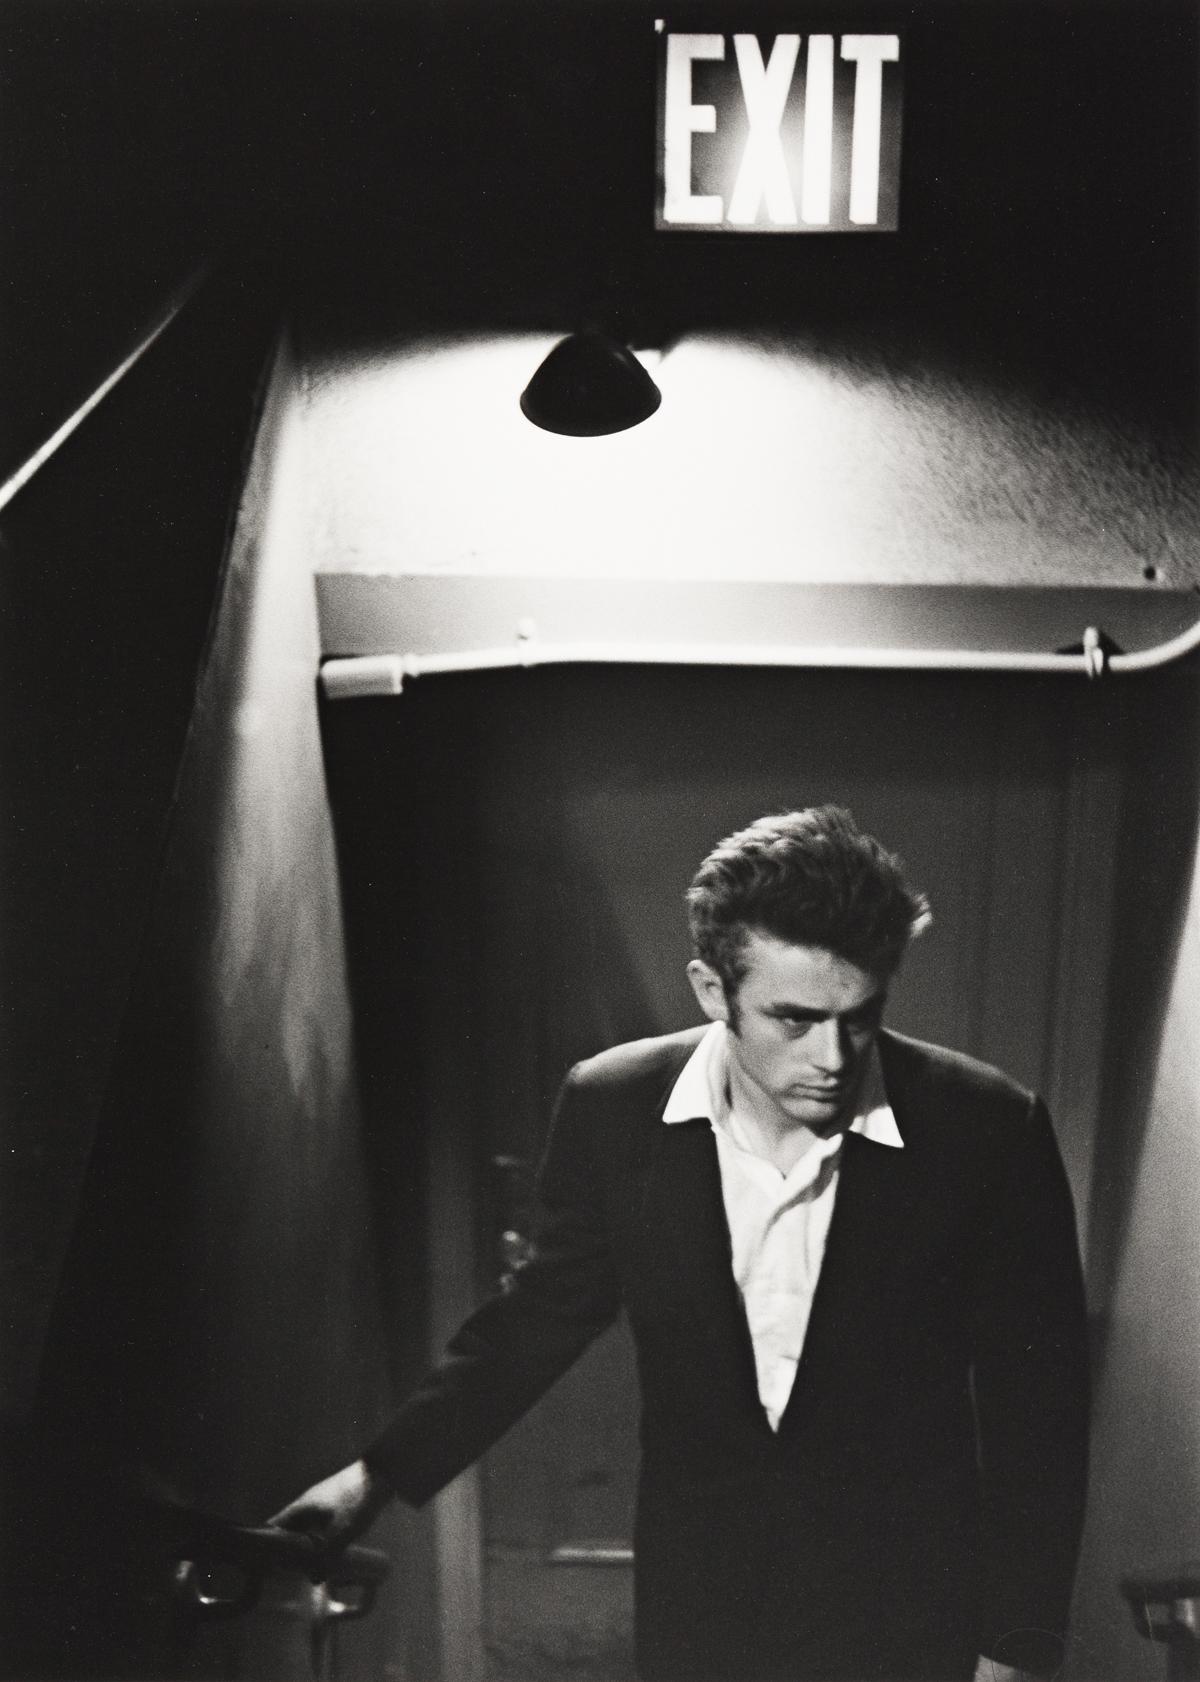 ROY SCHATT (1909-2002) James Dean underneath an exit sign.